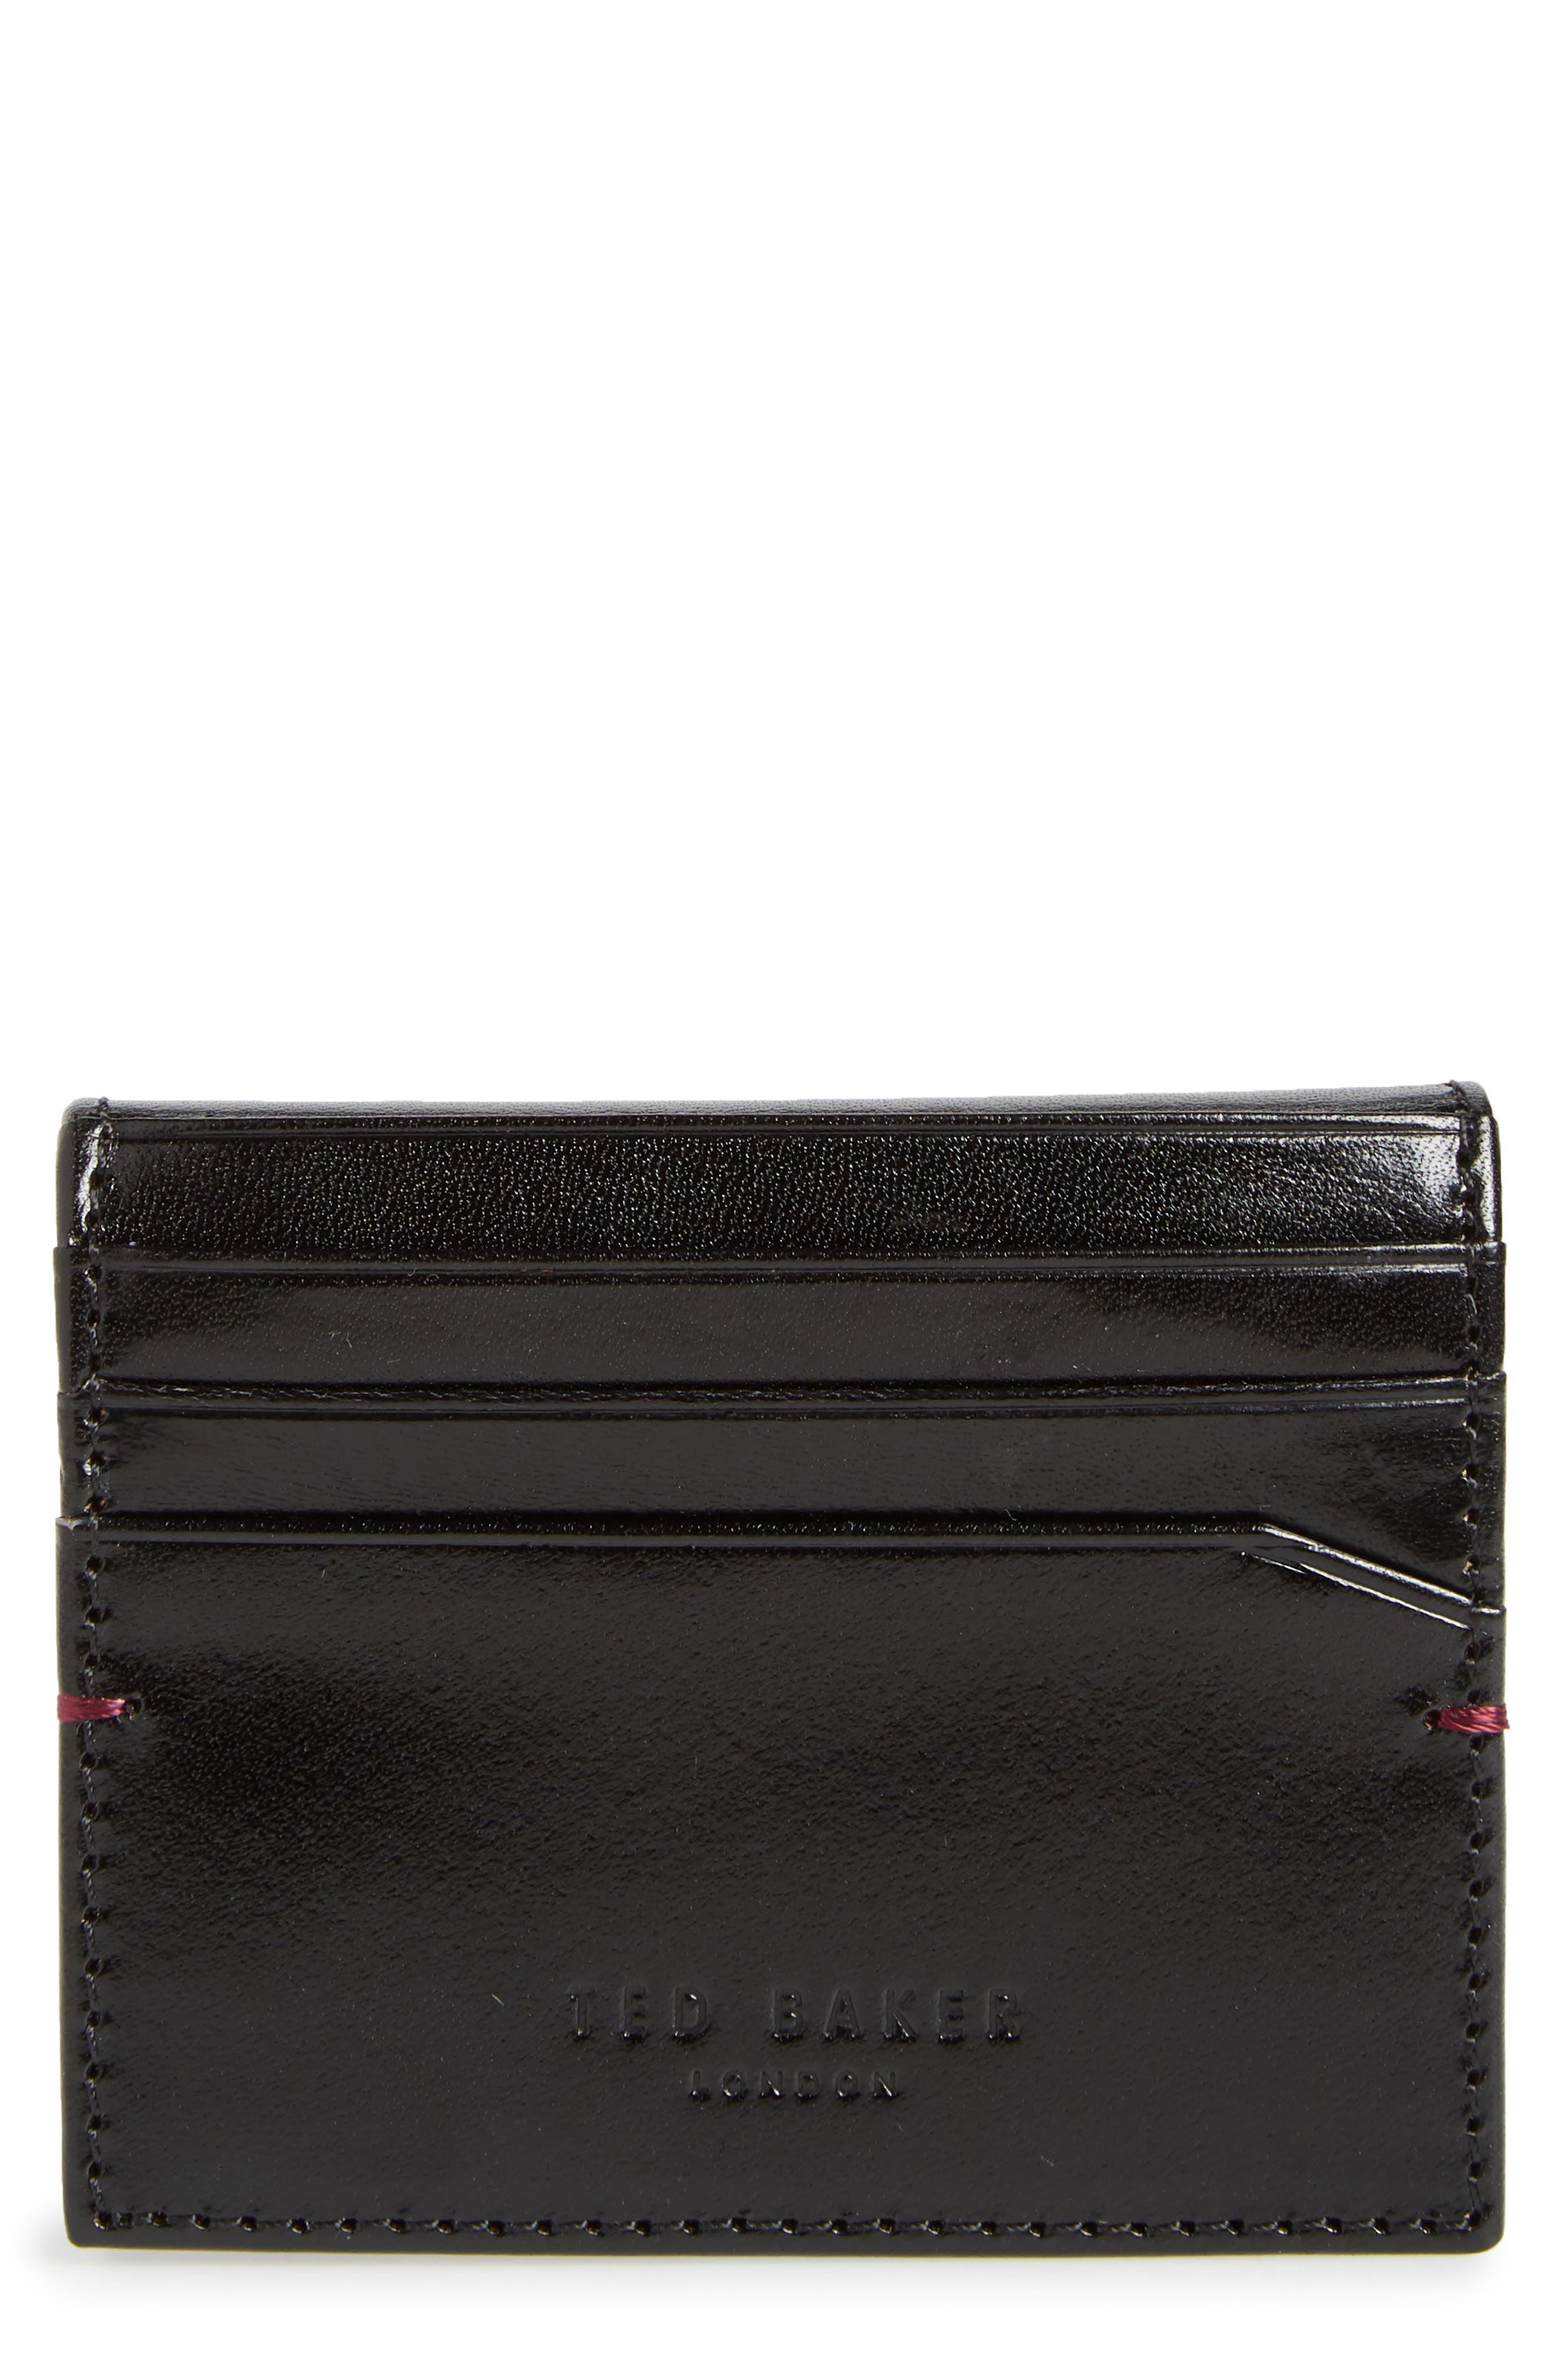 TED BAKER LONDON Contrast Internals Leather Card Case, Main, color, BLACK